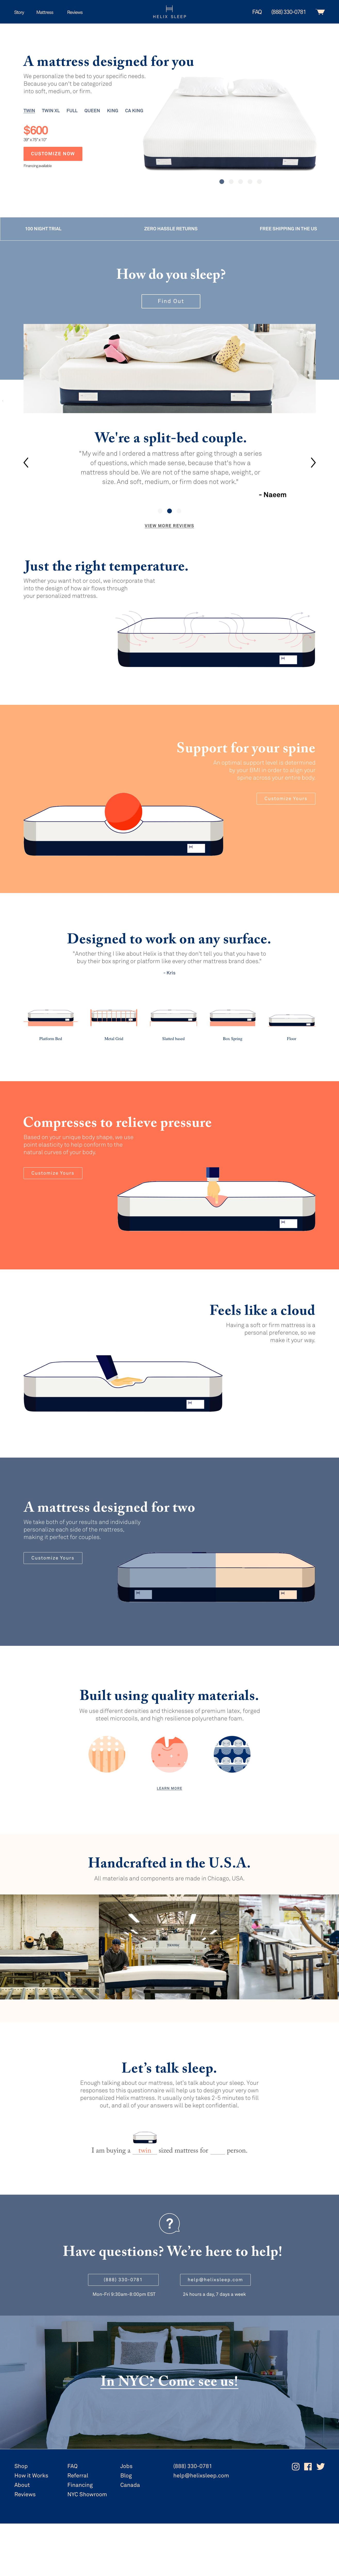 Helix Sleep Mattress Landing Page Design On Behance Landing Page Design Page Design Helix Sleep